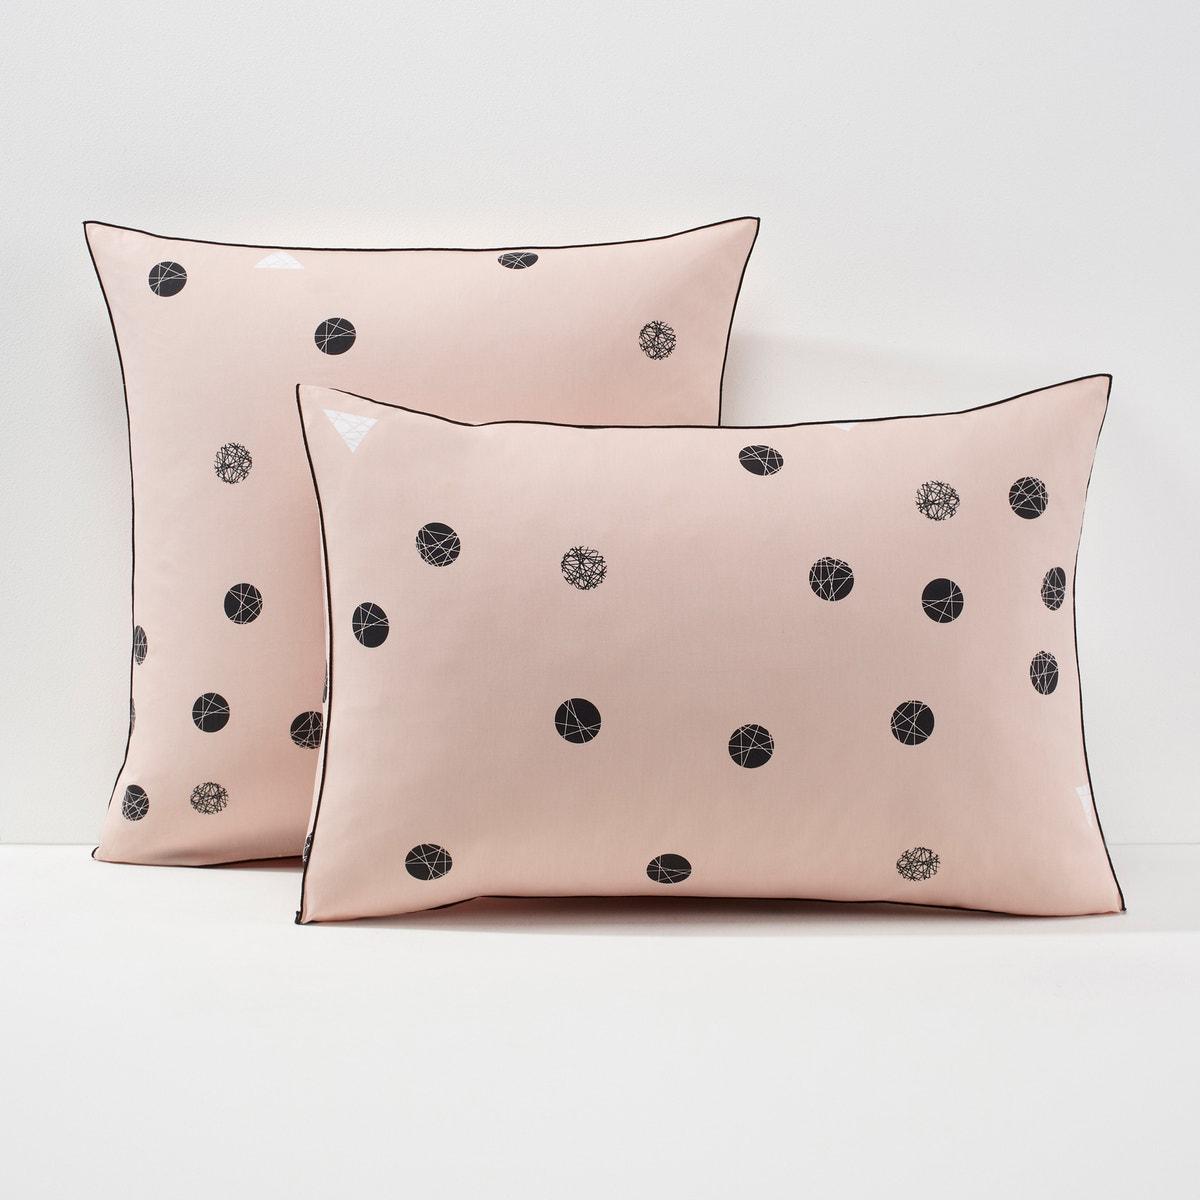 Bellvik コットン 幾何学模様プリントパーケル 枕カバー